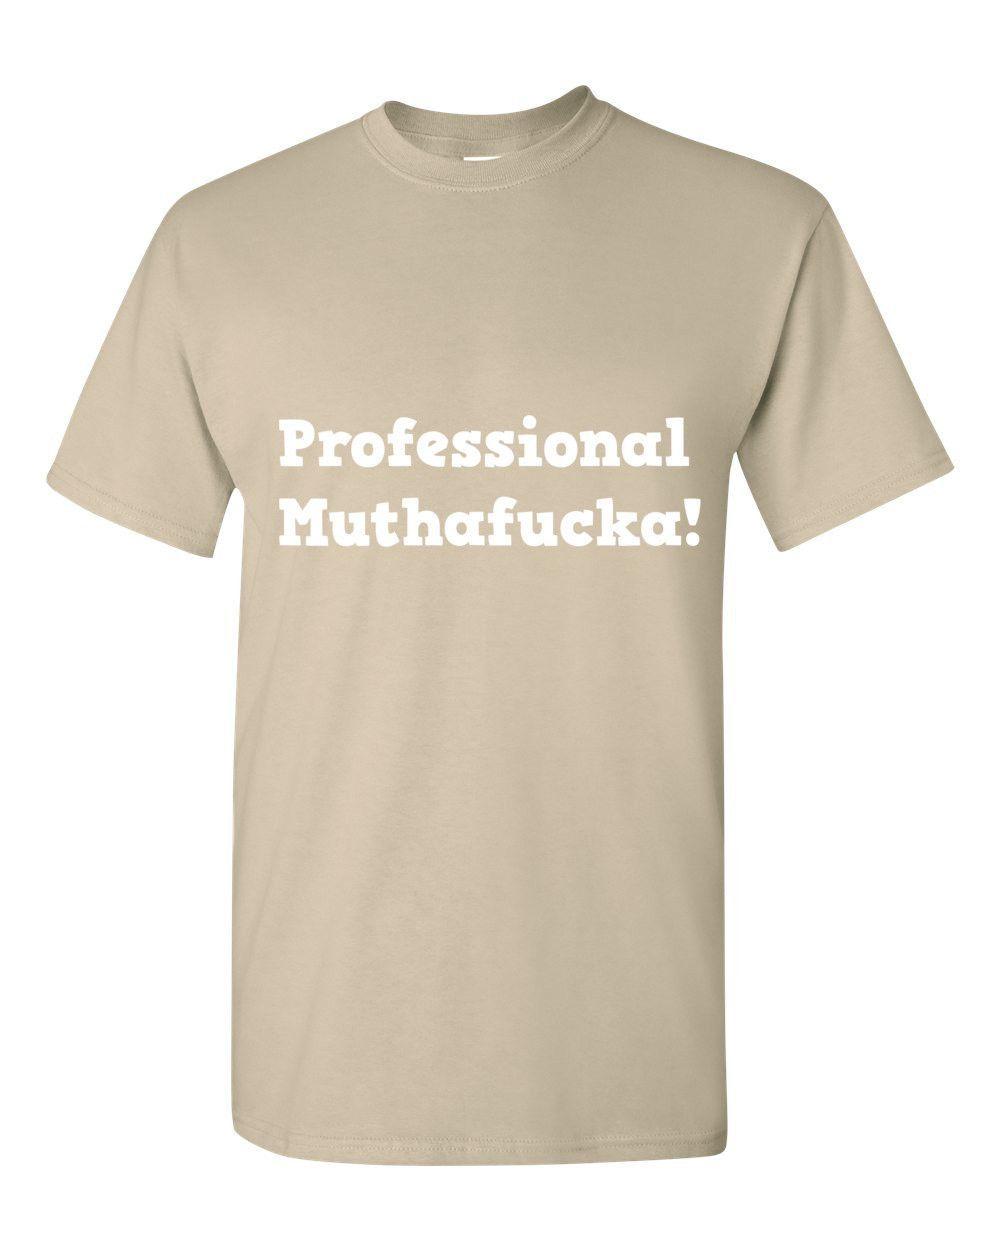 """Professional Muthafucka!"" Short sleeve t-shirt"